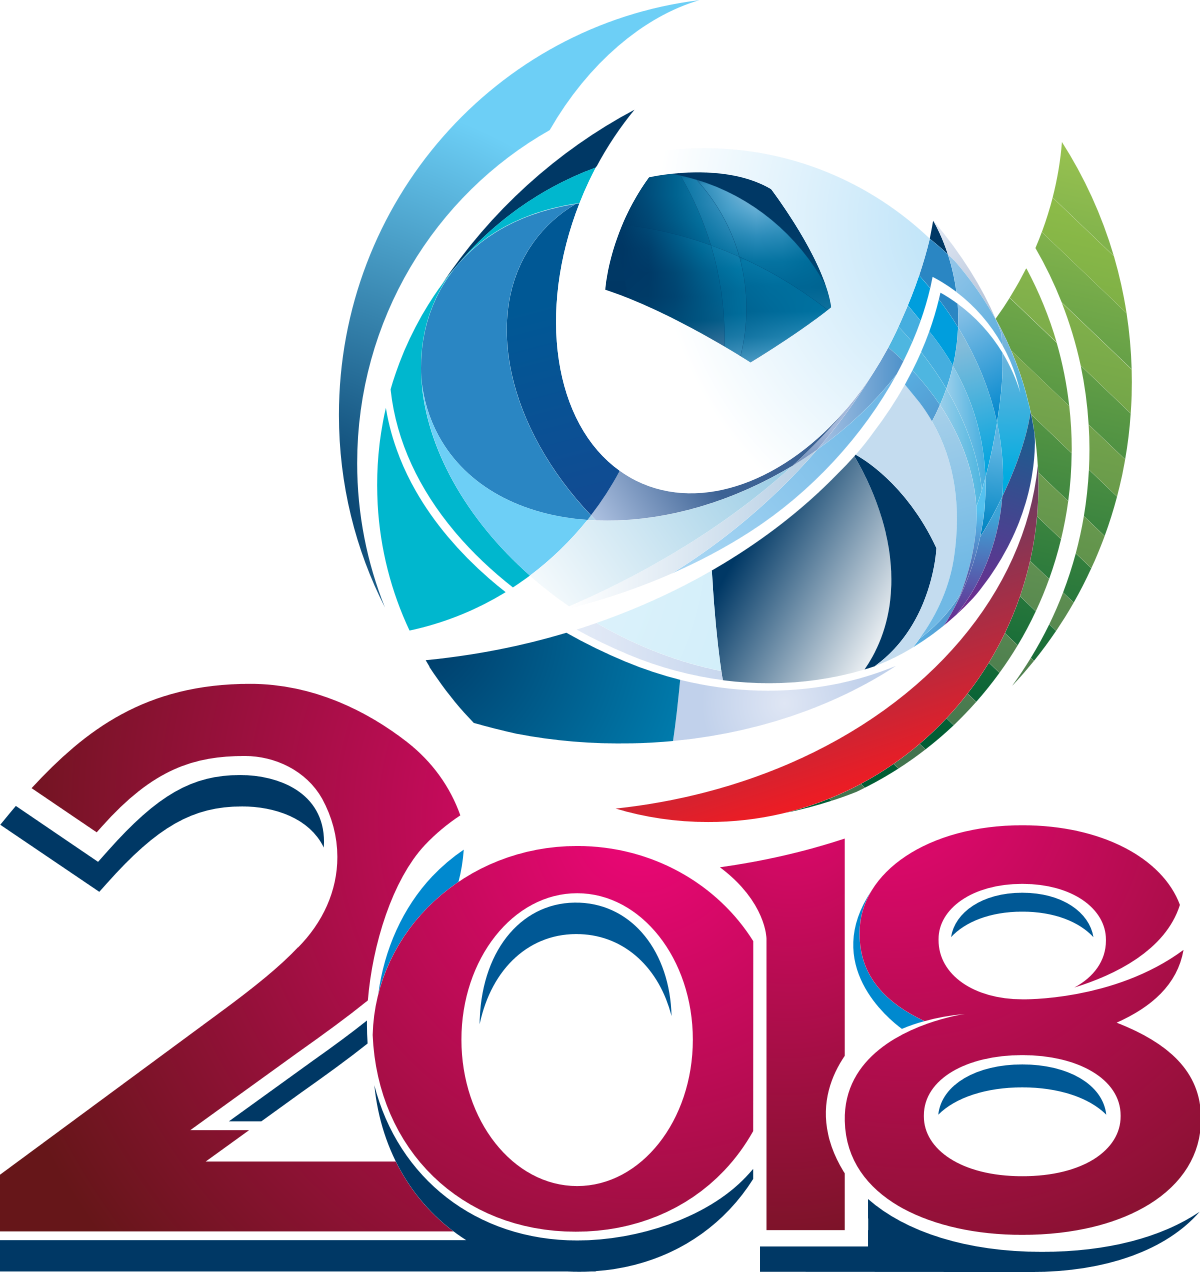 Russia 2018 FIFA World Cup bid.